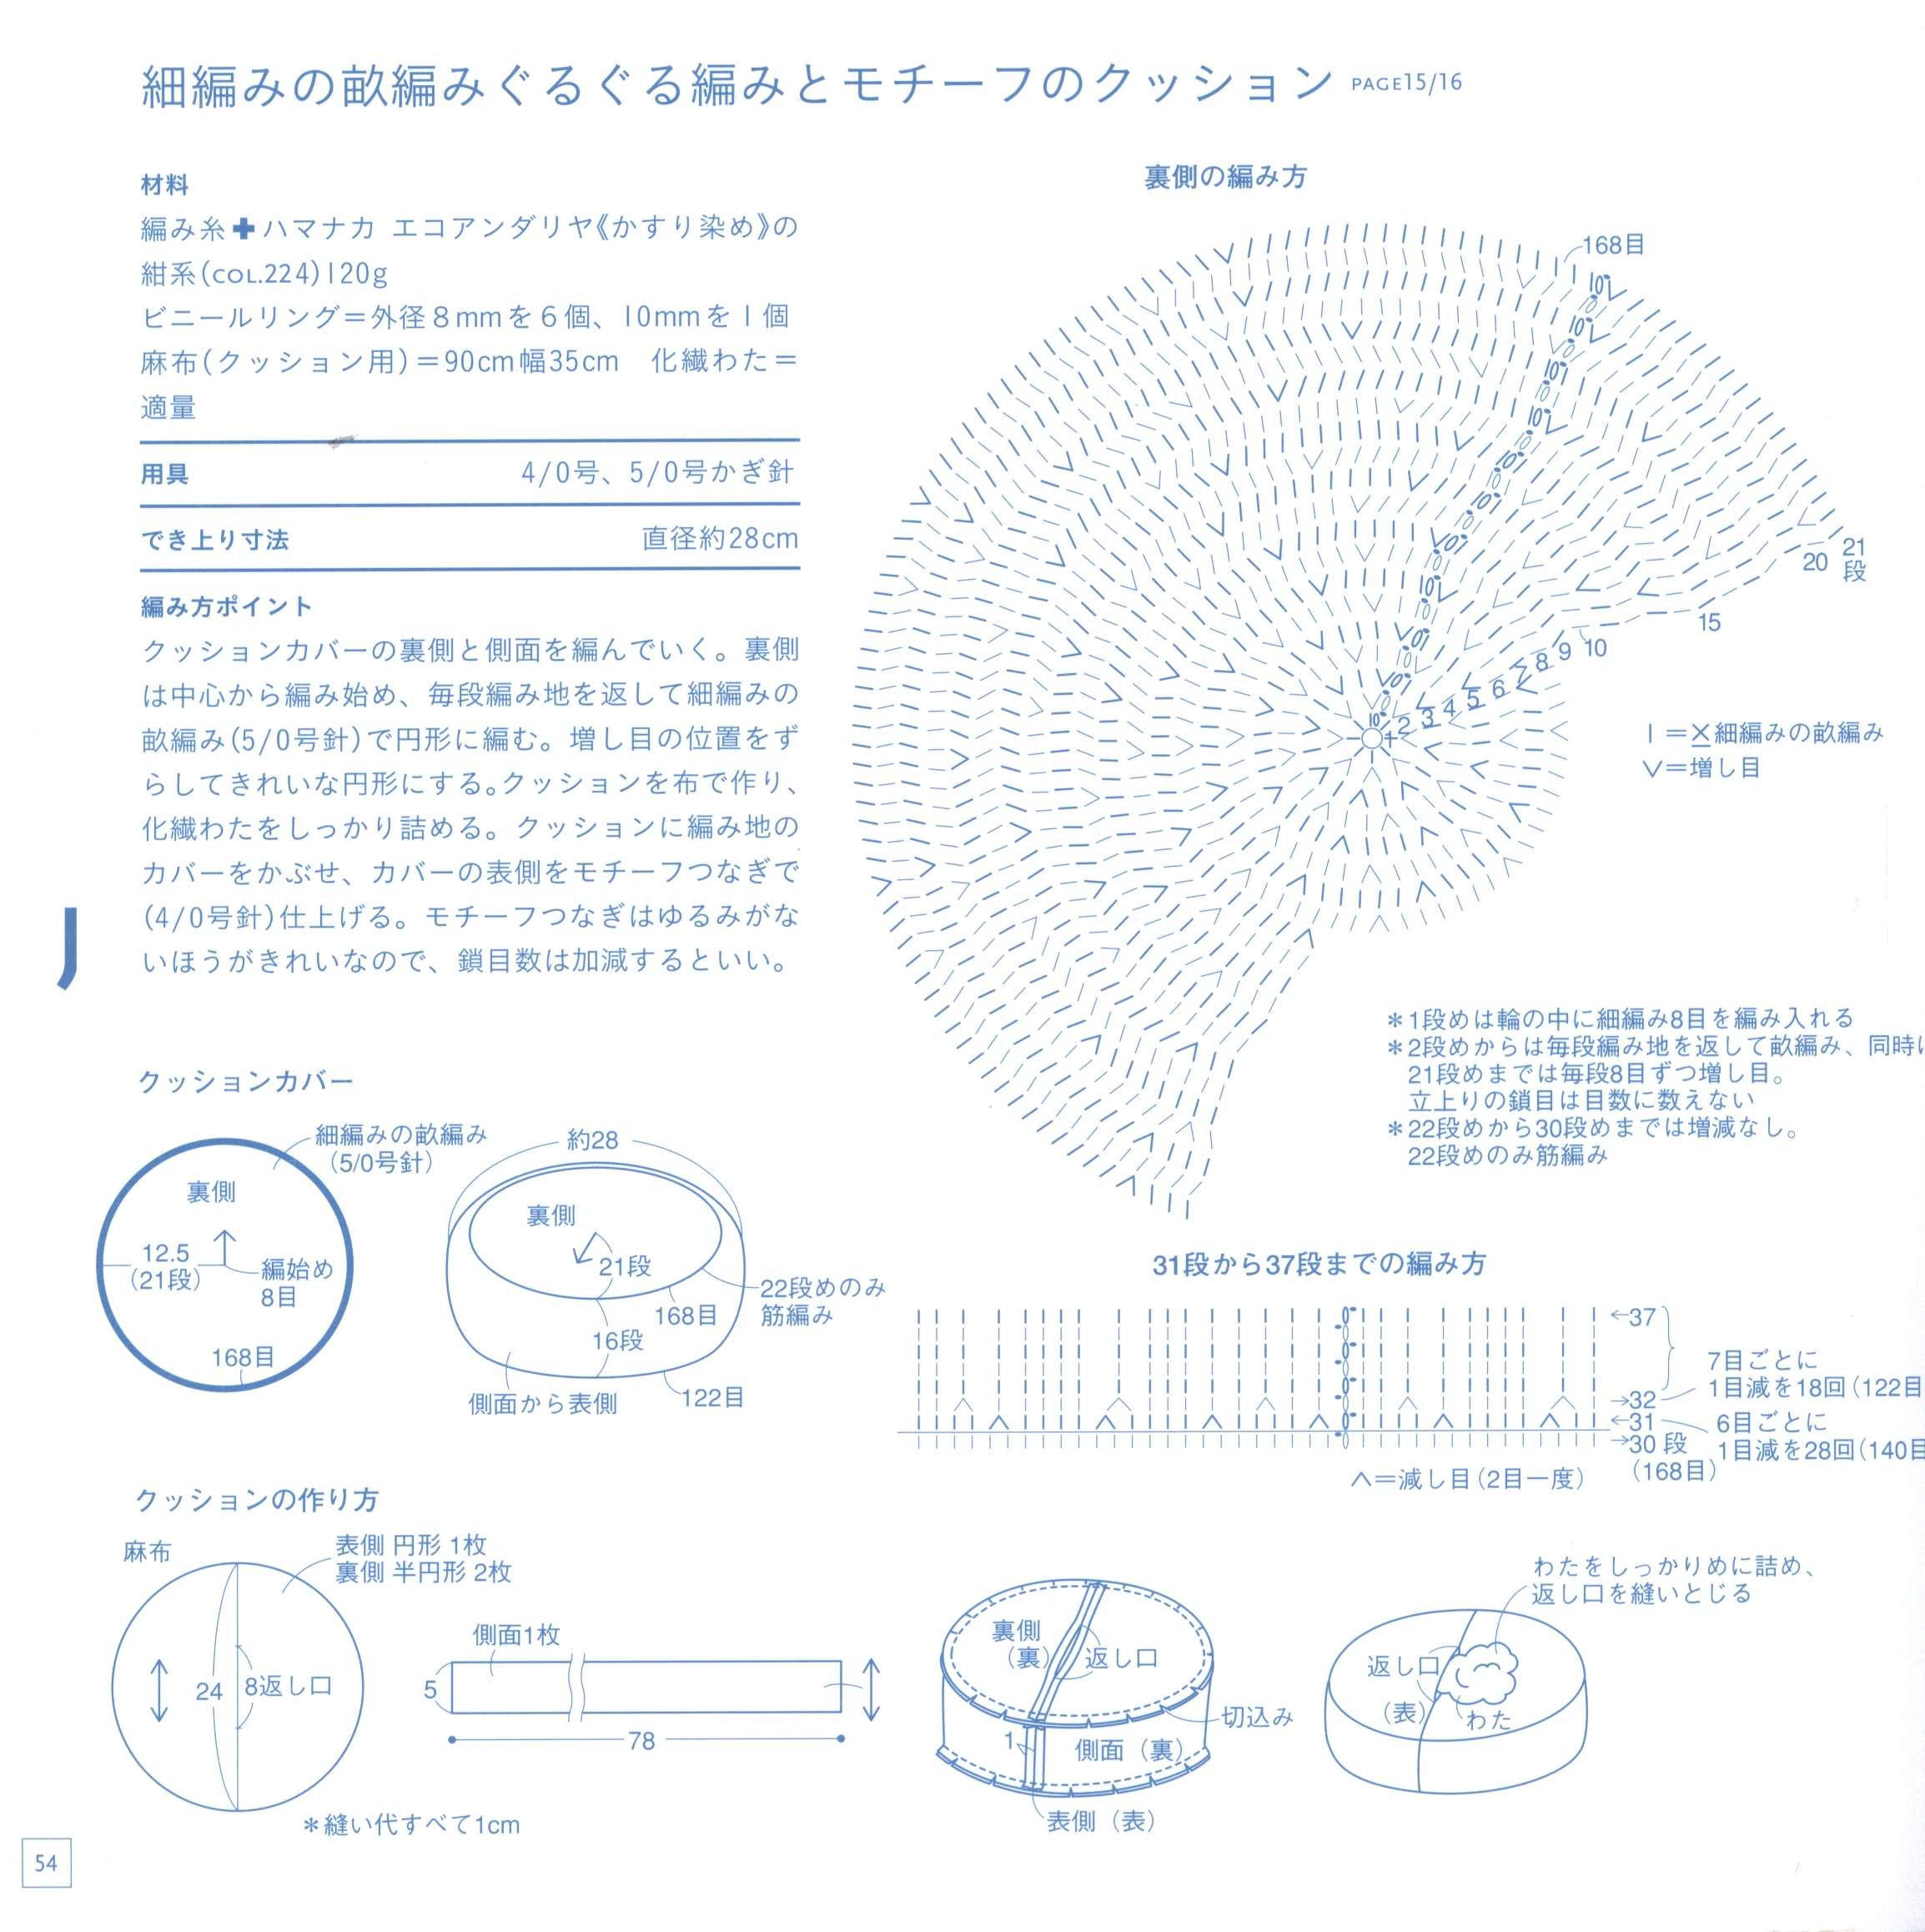 0026_00085 (2)